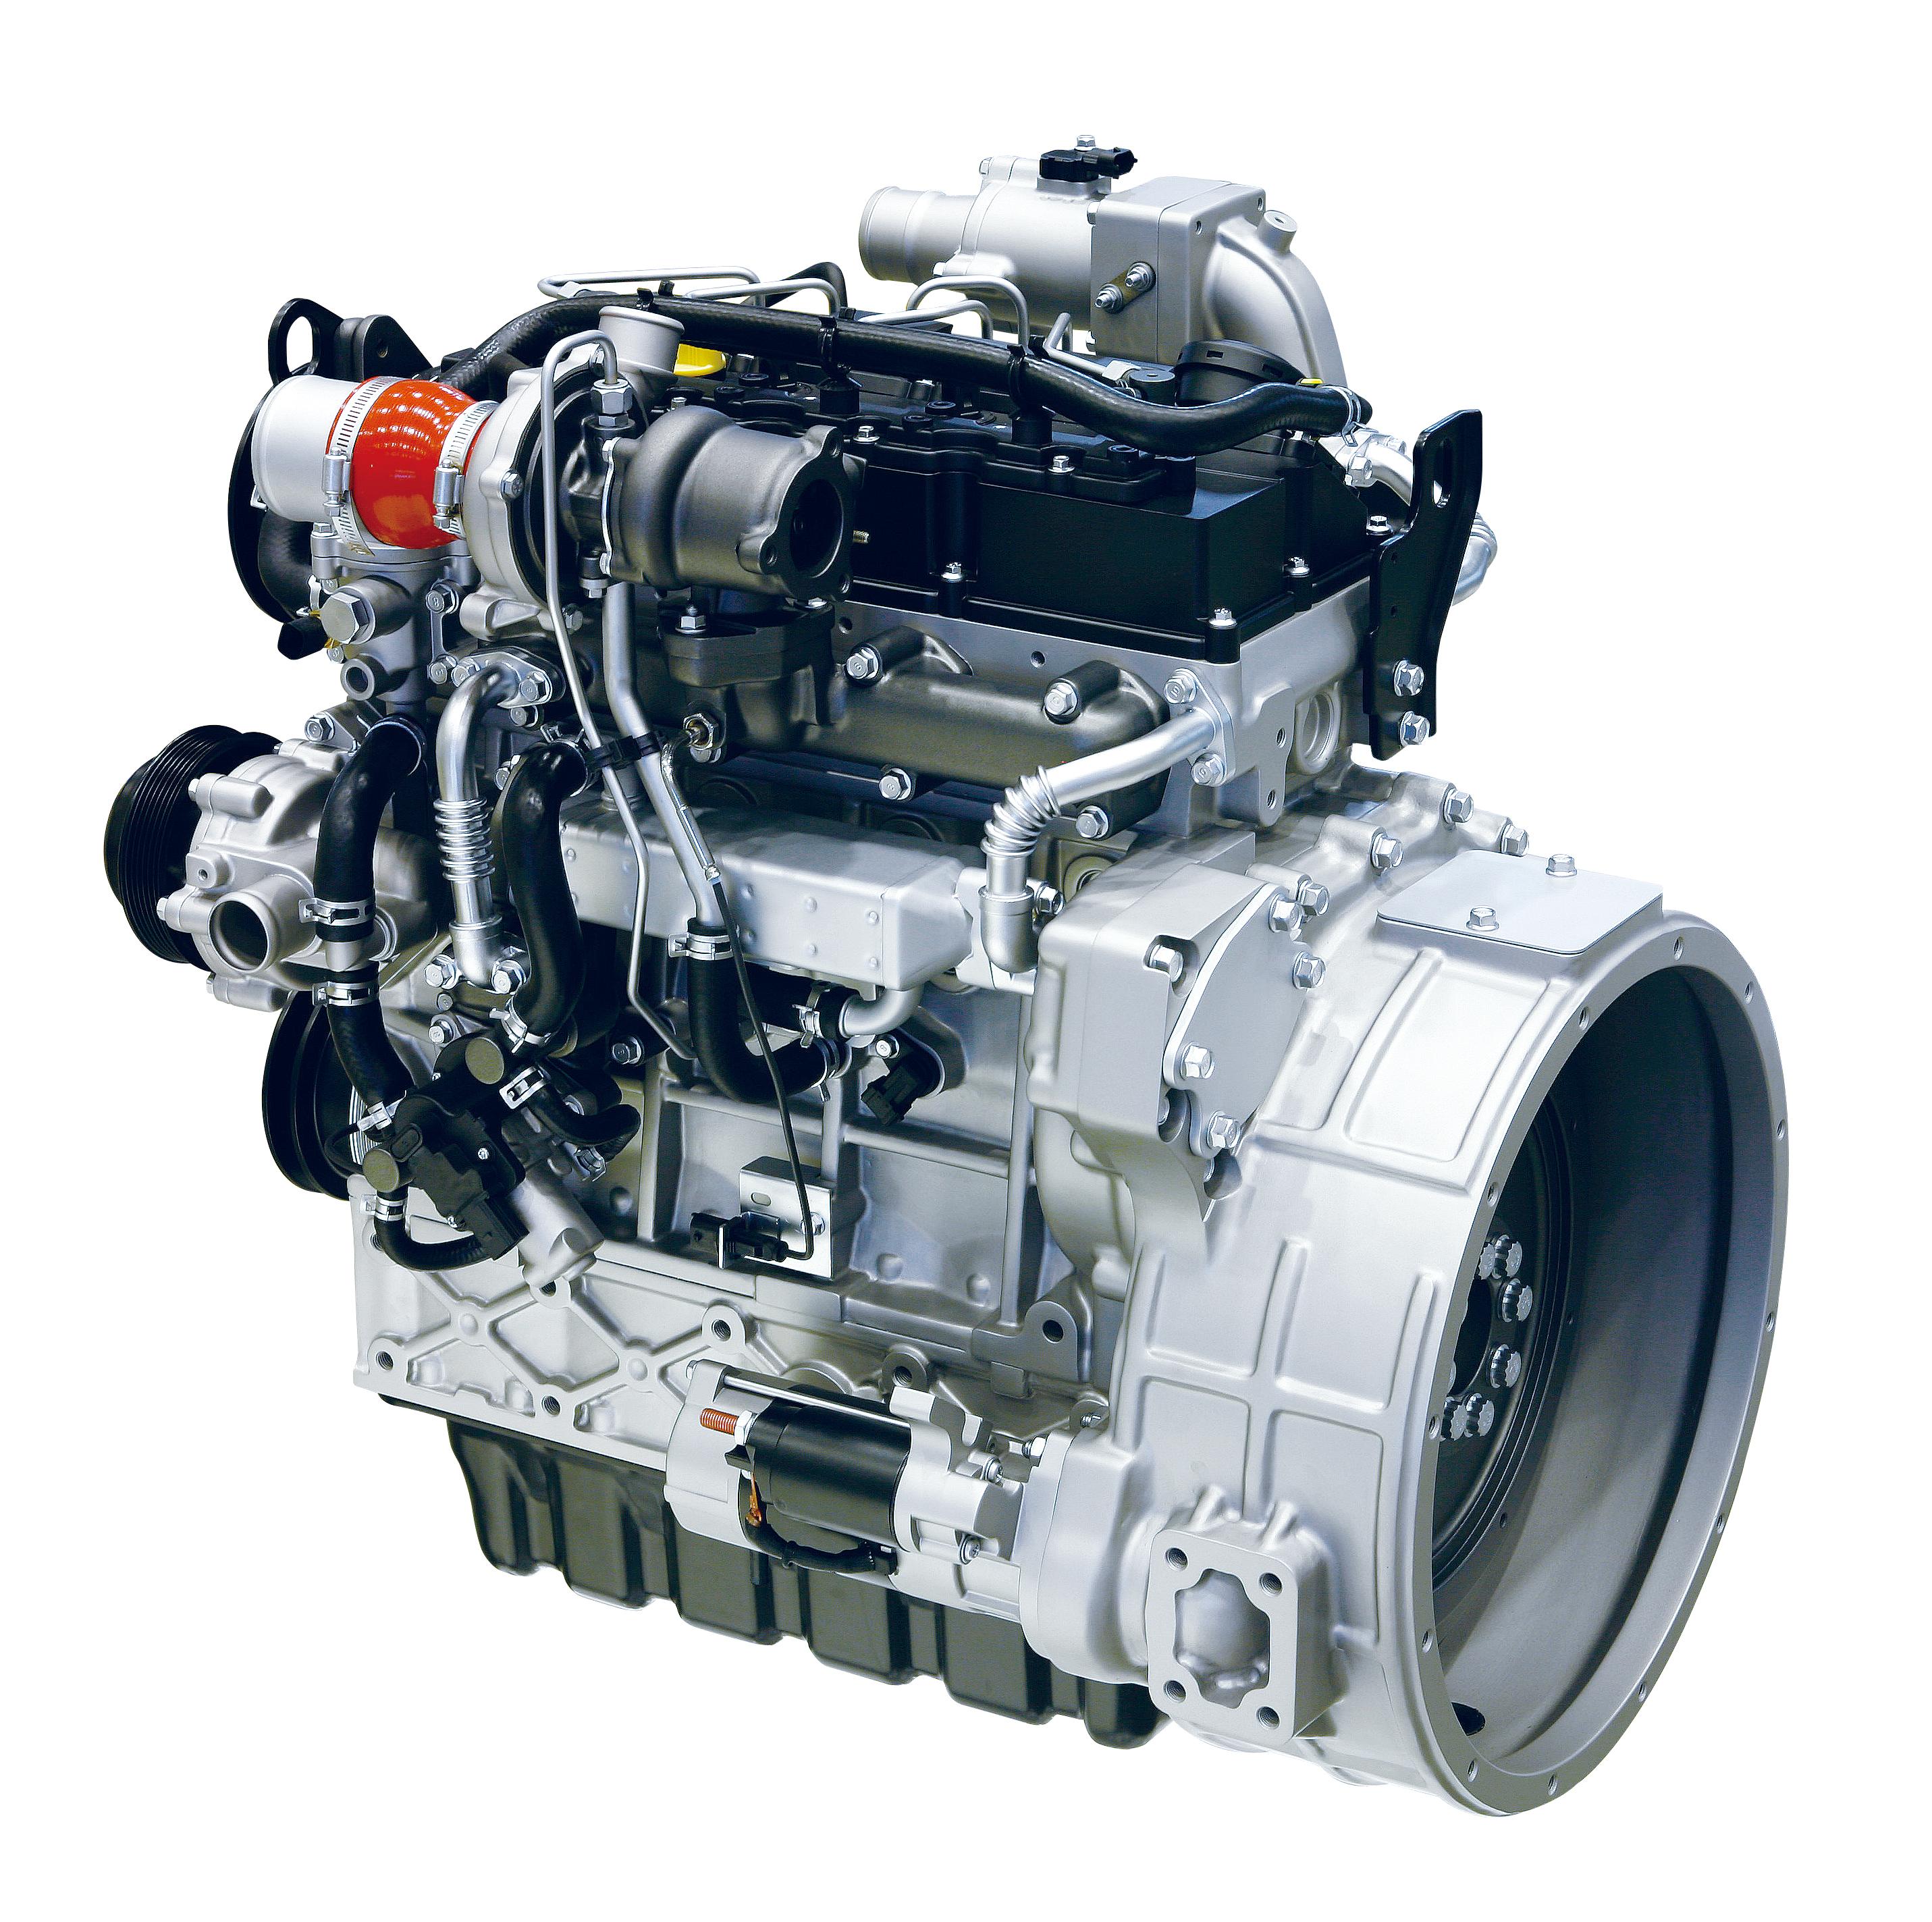 Nowe kompaktowe silniki Bobcat na rynek europejski